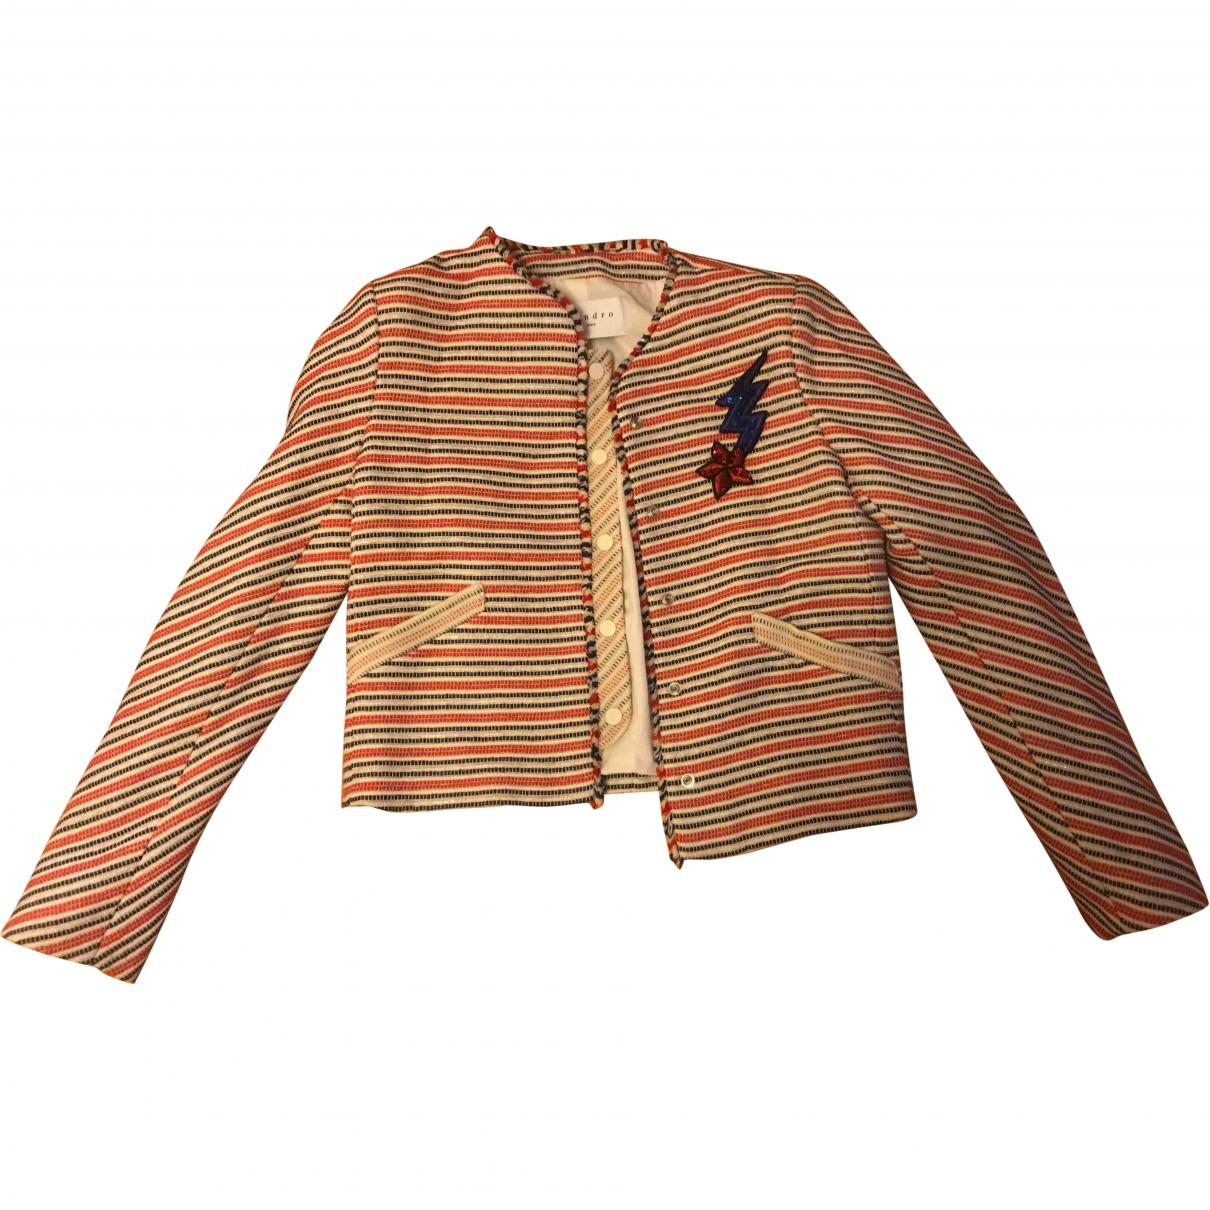 Sandro \N Multicolour Cotton jacket for Women 36 FR